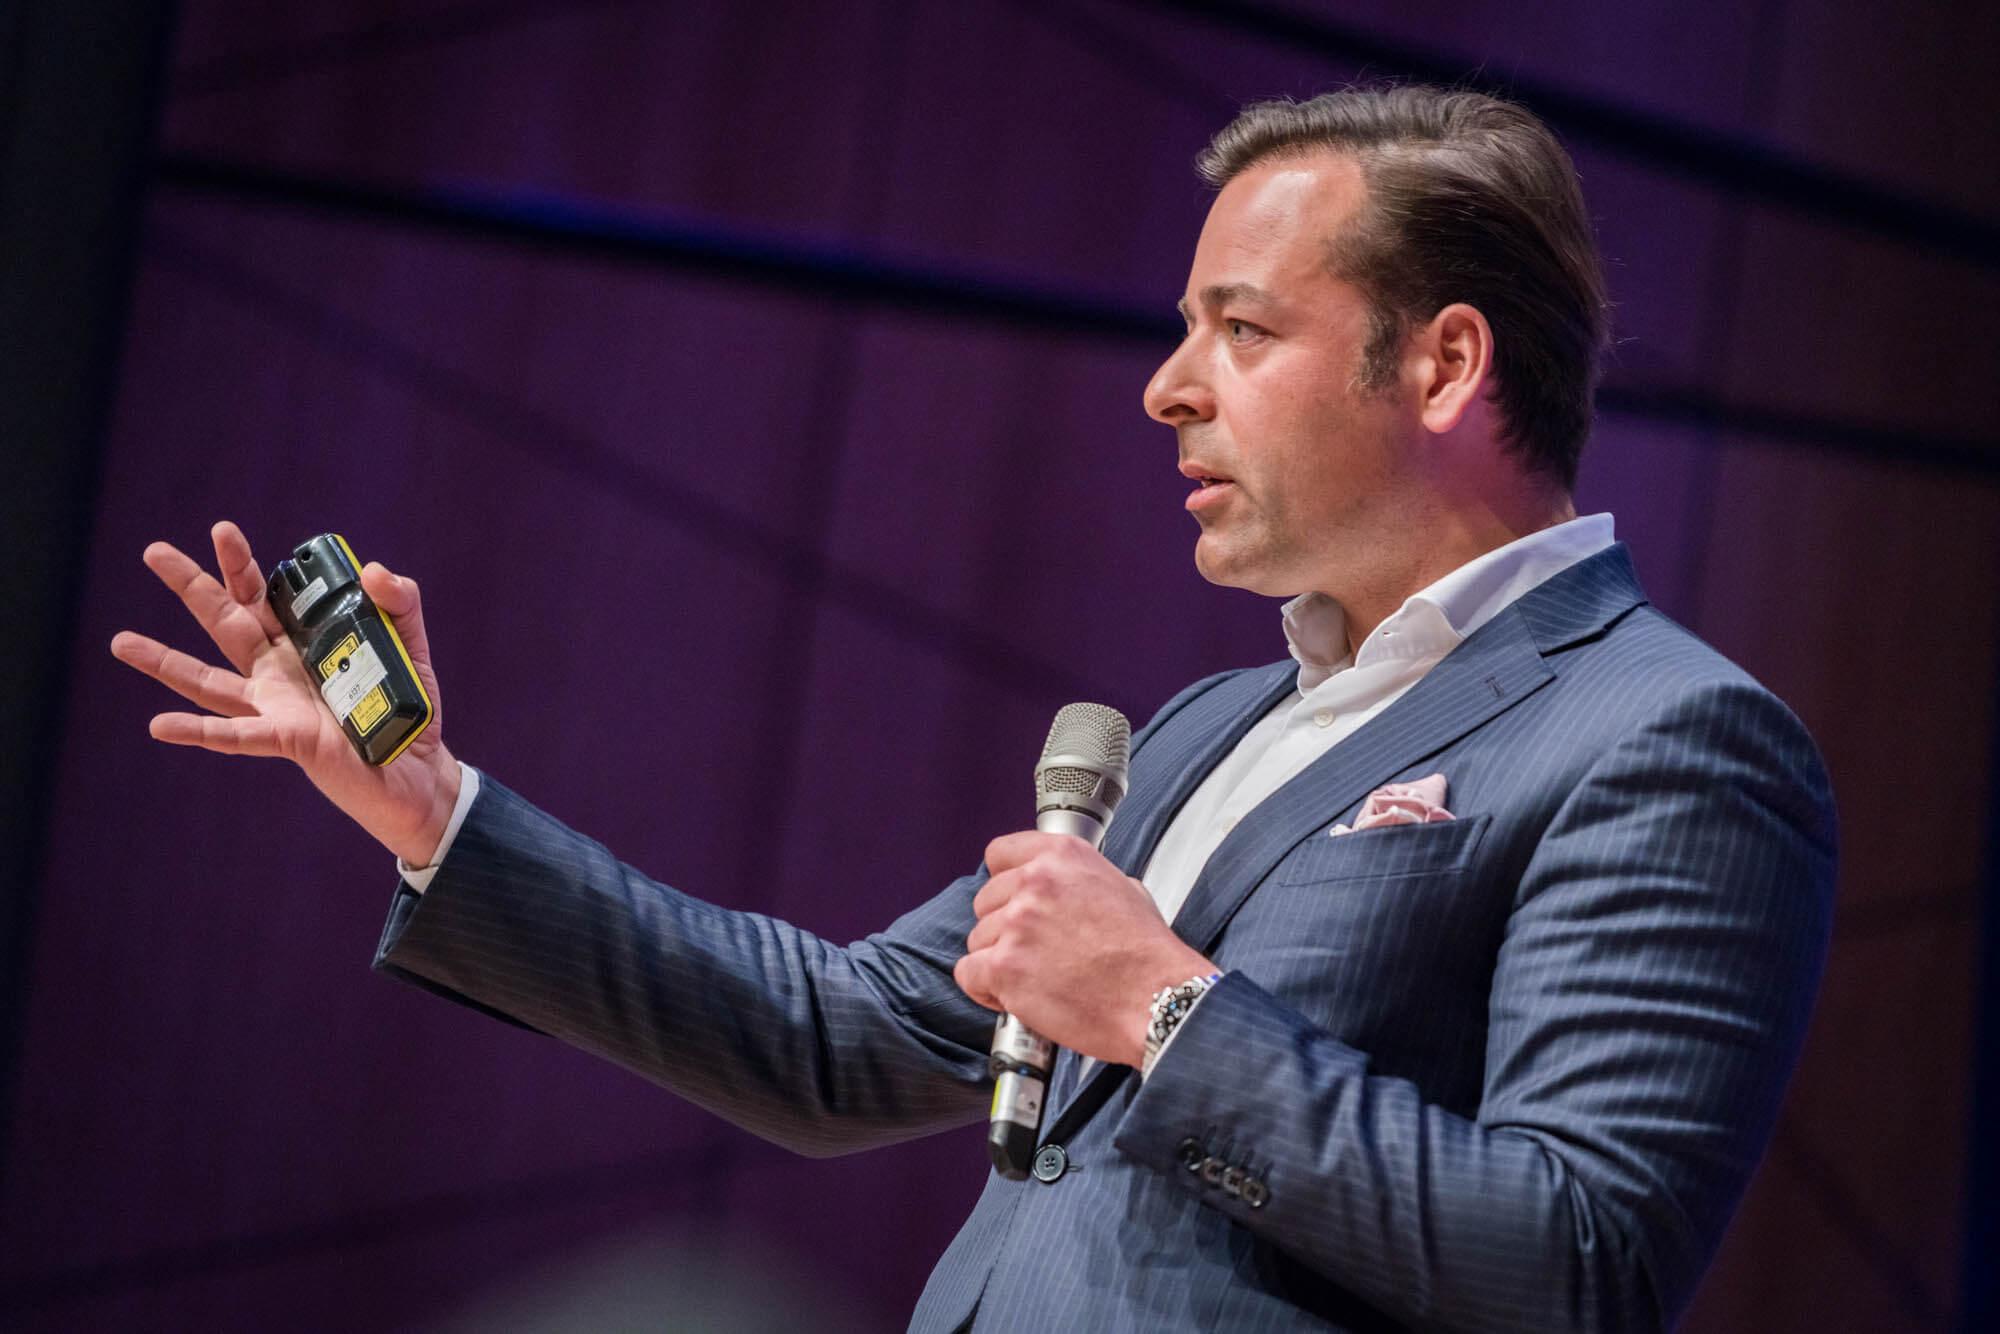 Fotograf Frankfurt Speaker Jack Nasher Event Entrepreneur University